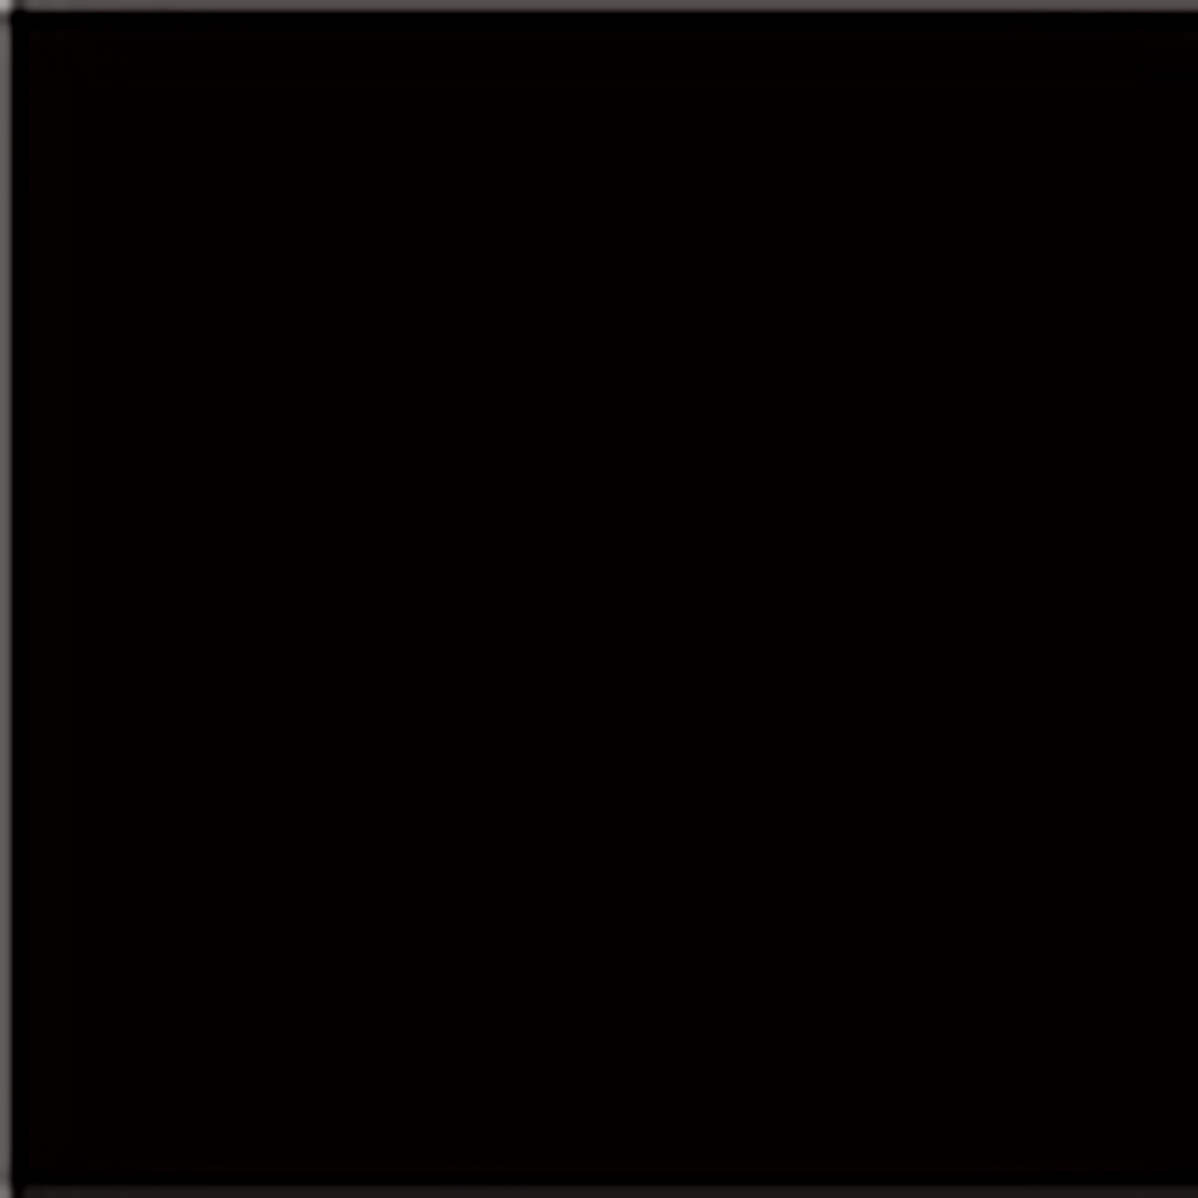 Sigma Negro 20 x 20